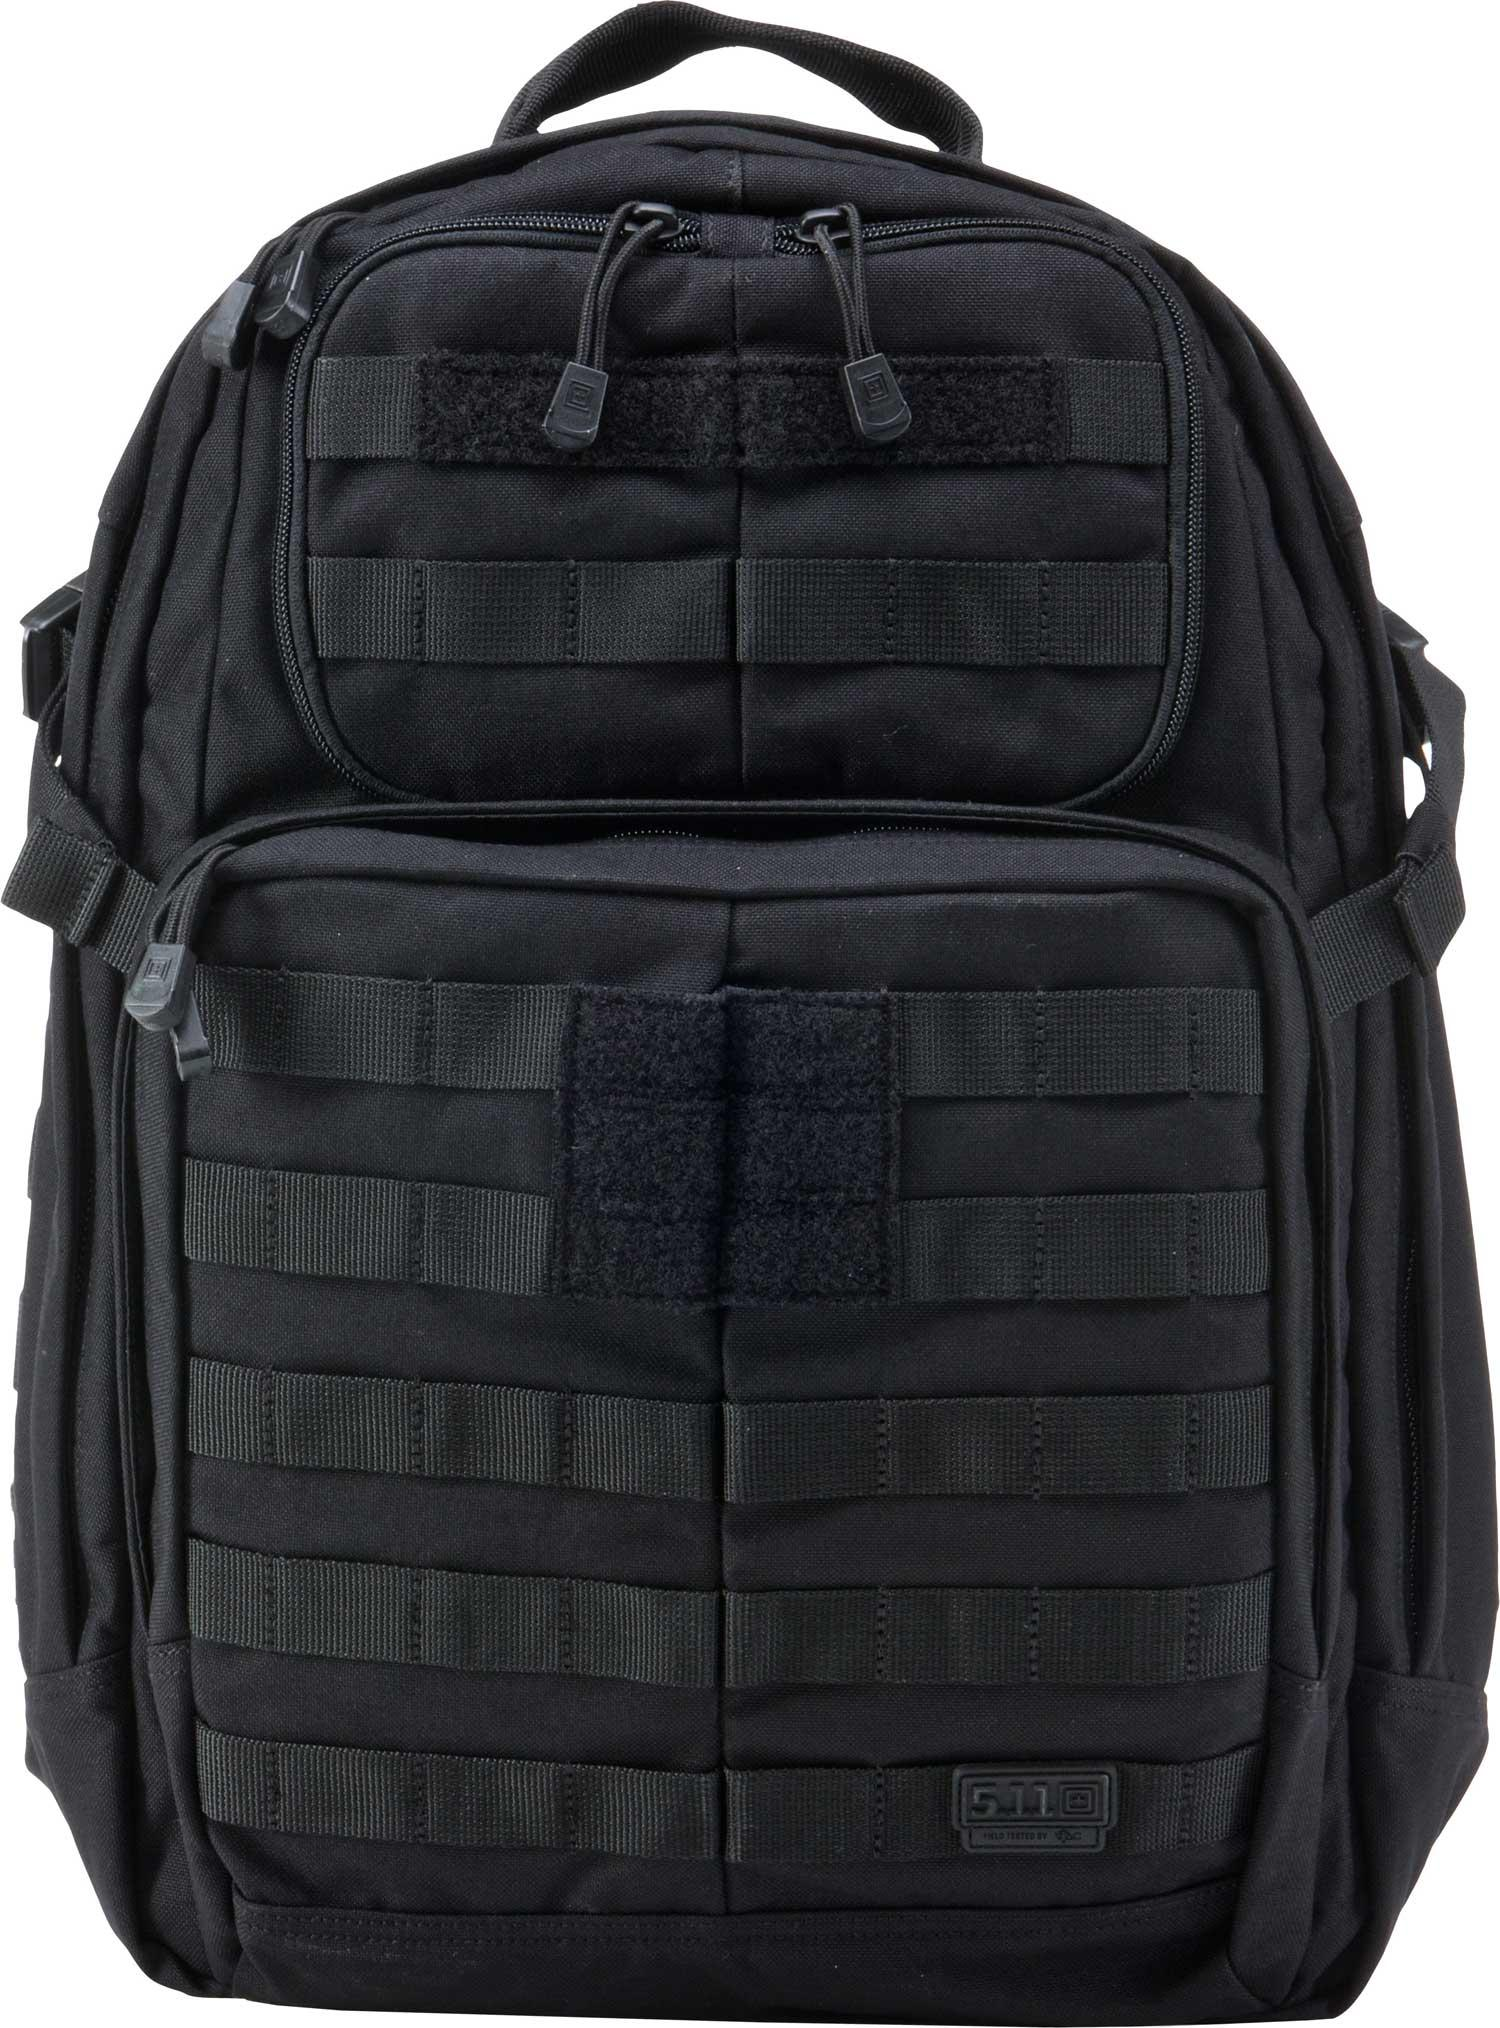 5.11 Tactical RUSH 24 Backpack Black